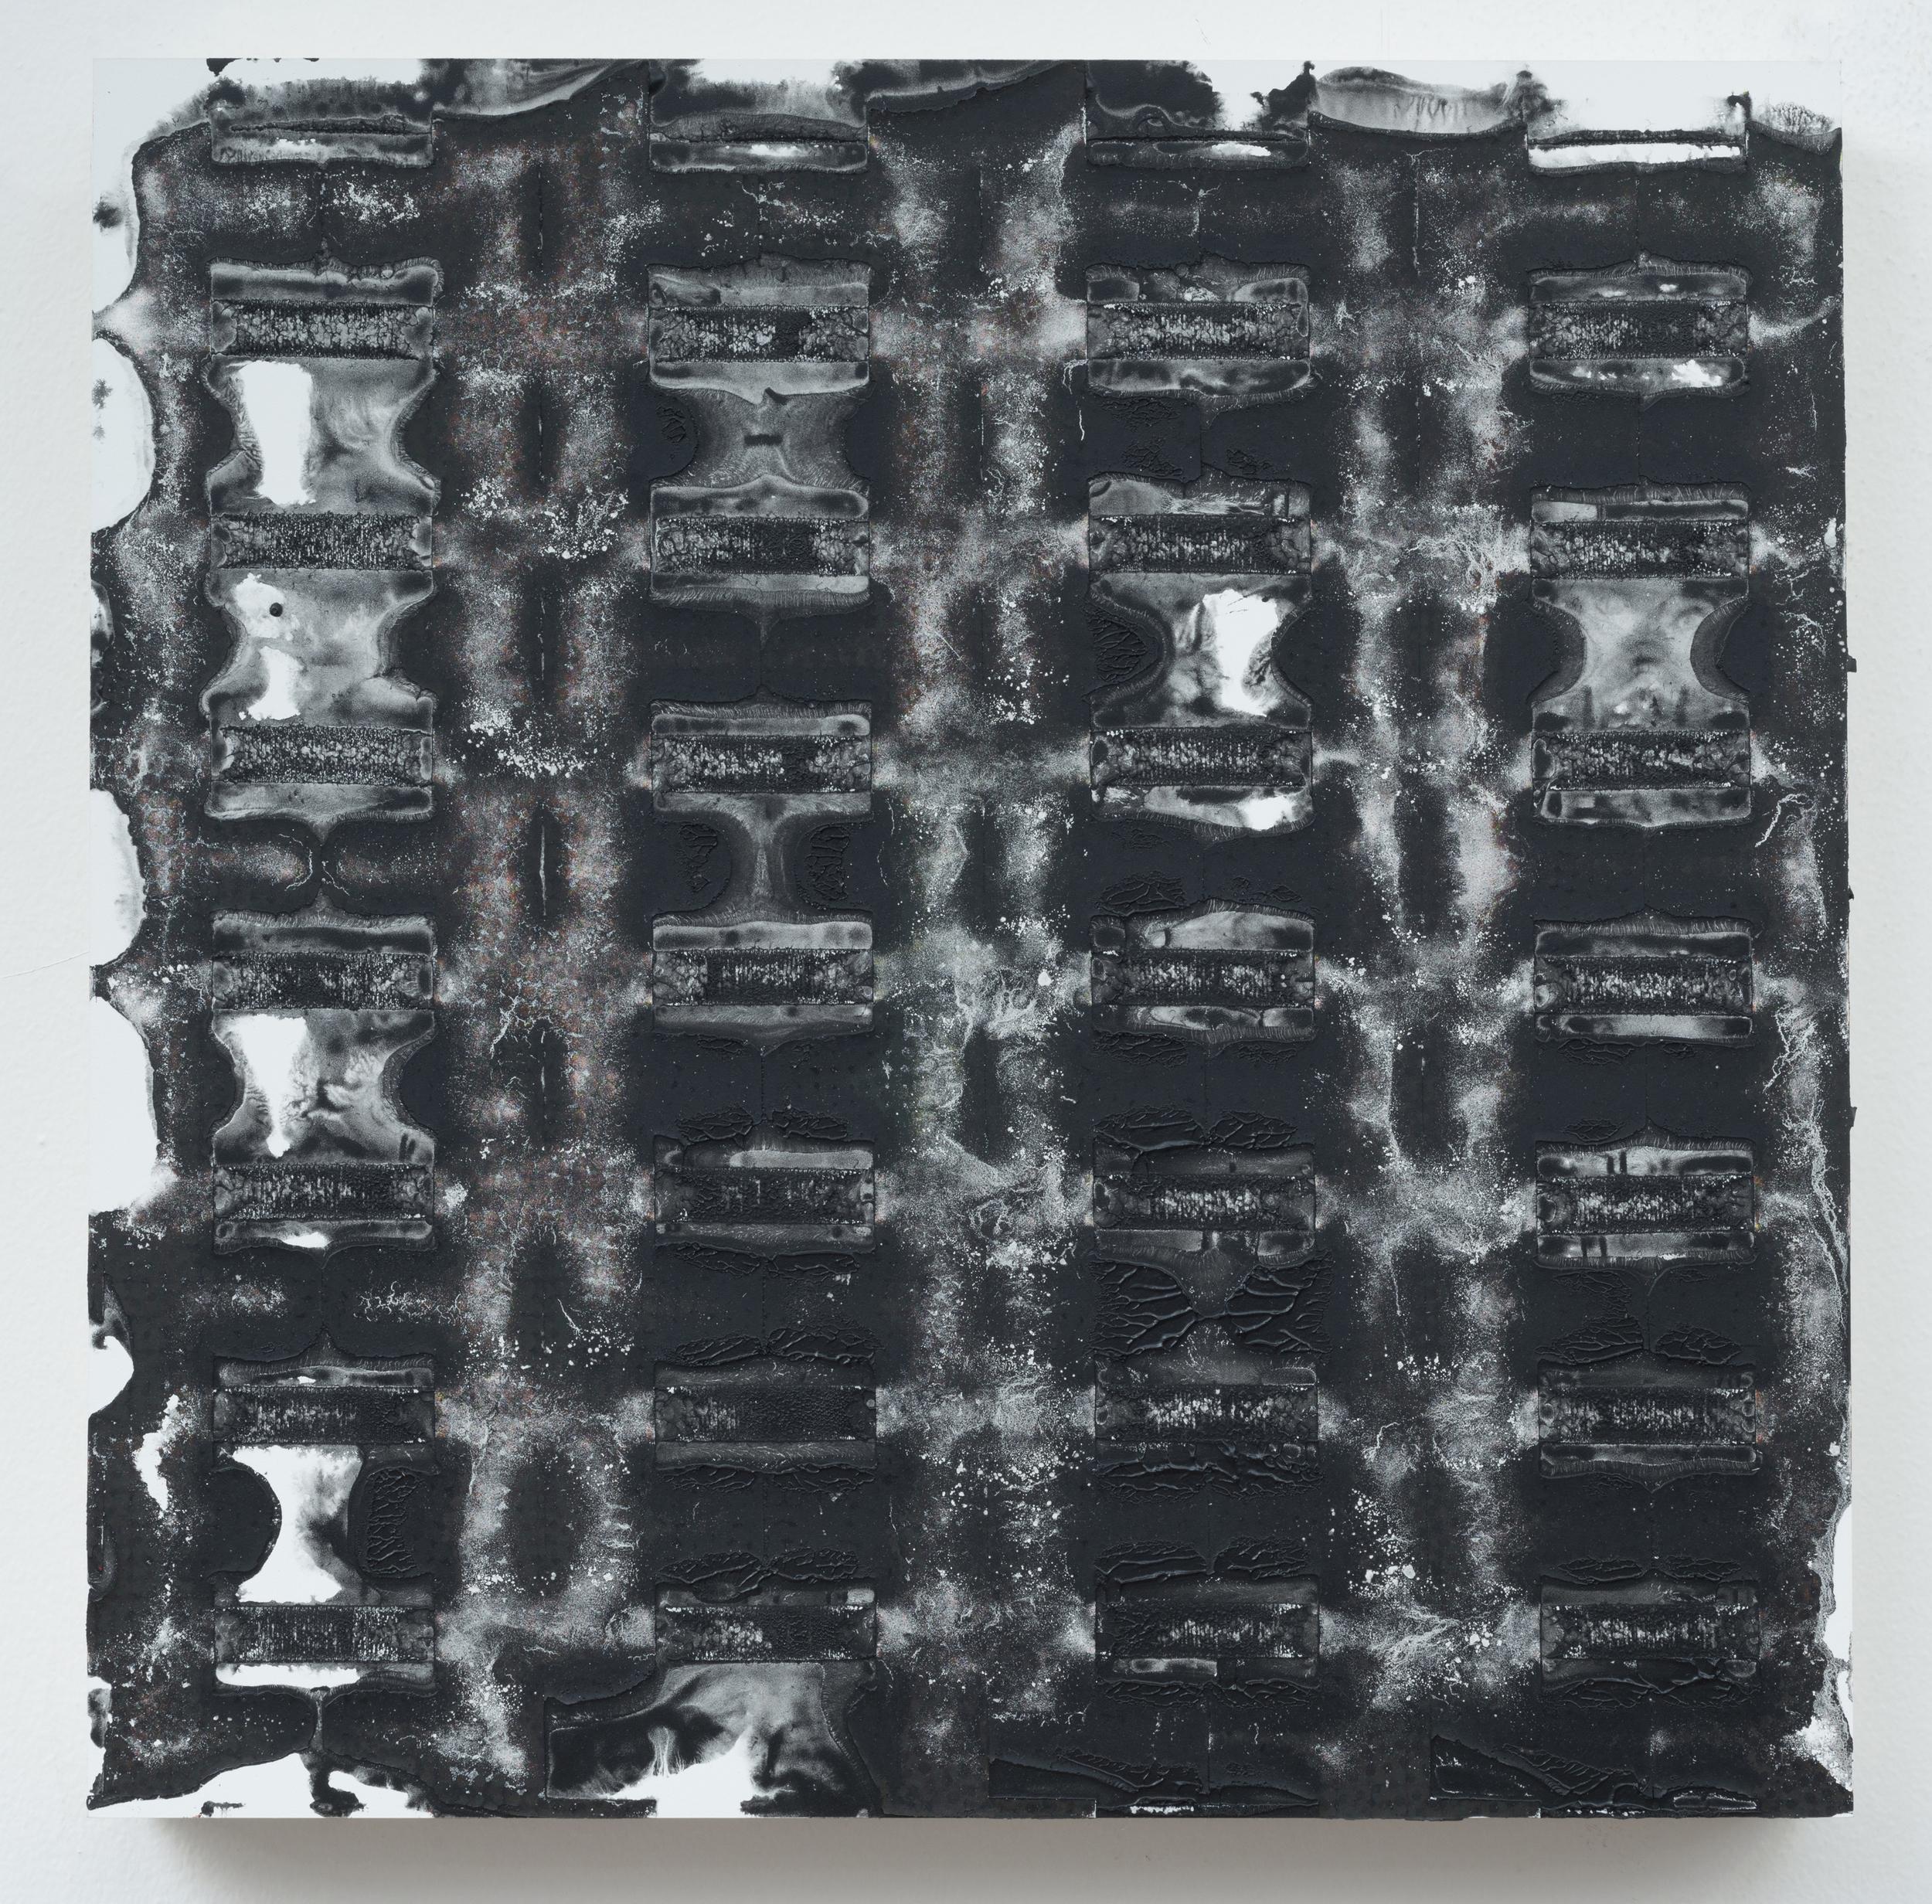 Untitled (04), 2012